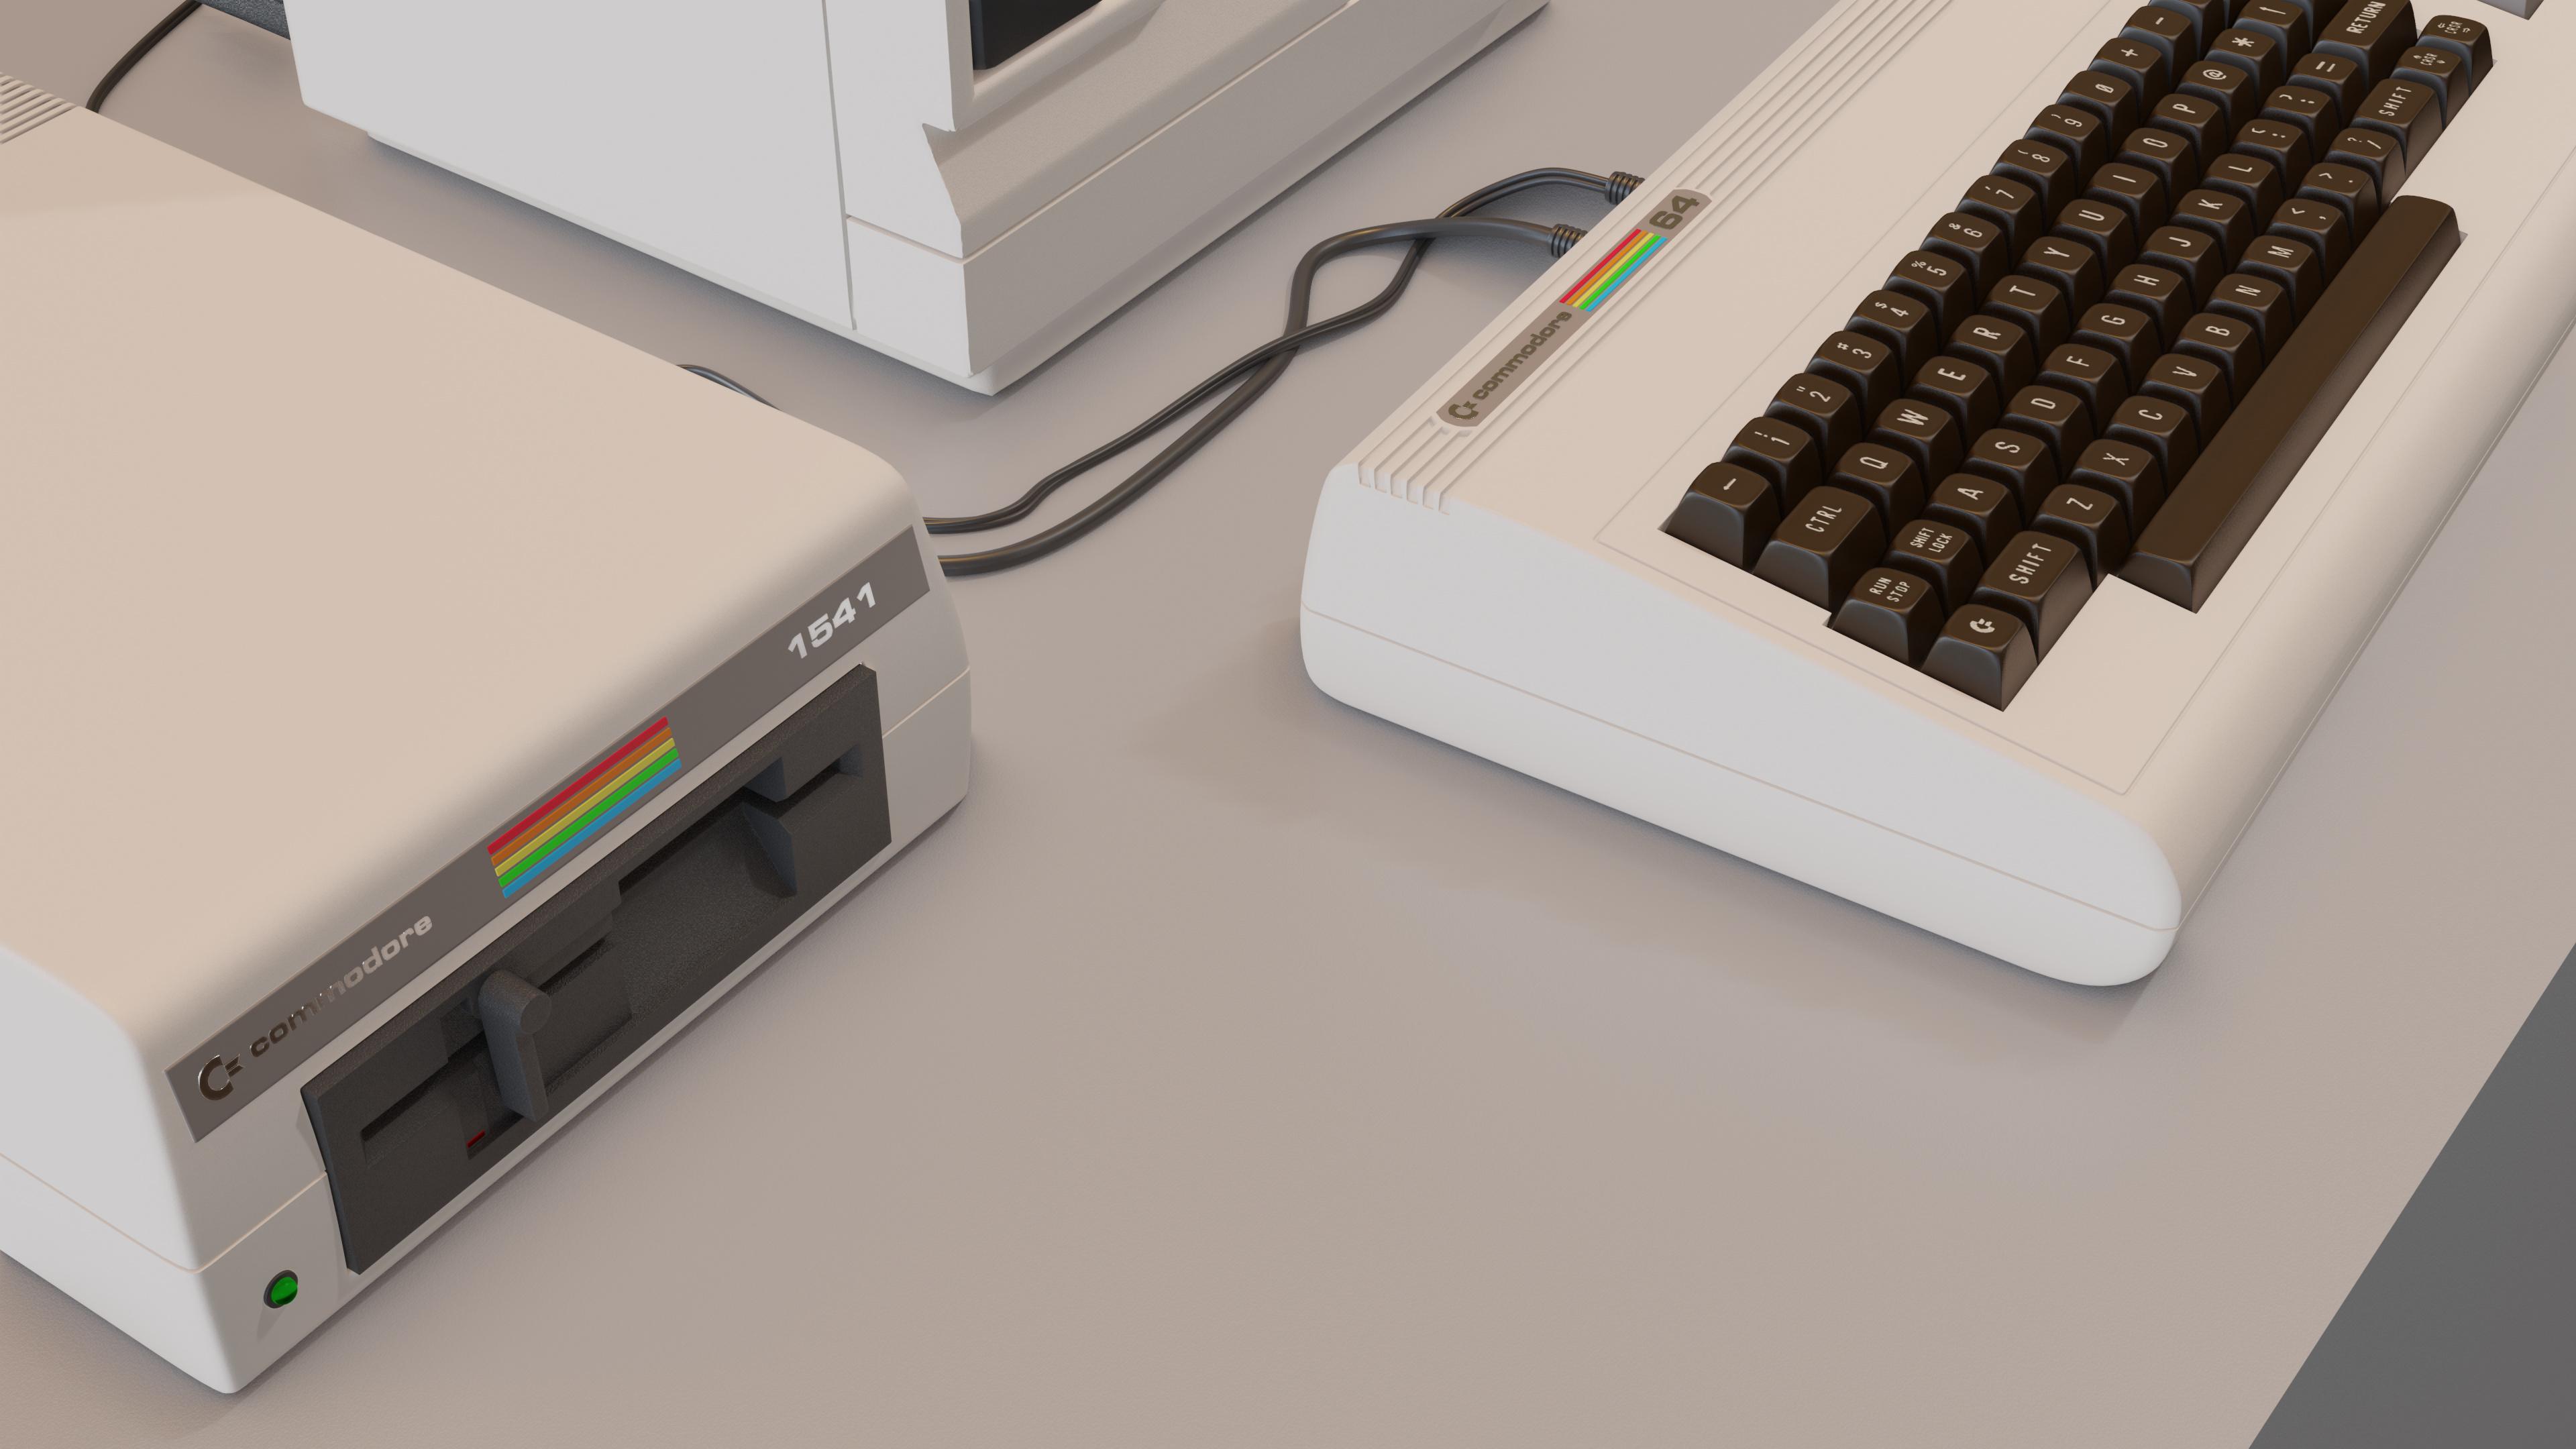 Commodore 64 - Forum Gallery - Blender Artists Community